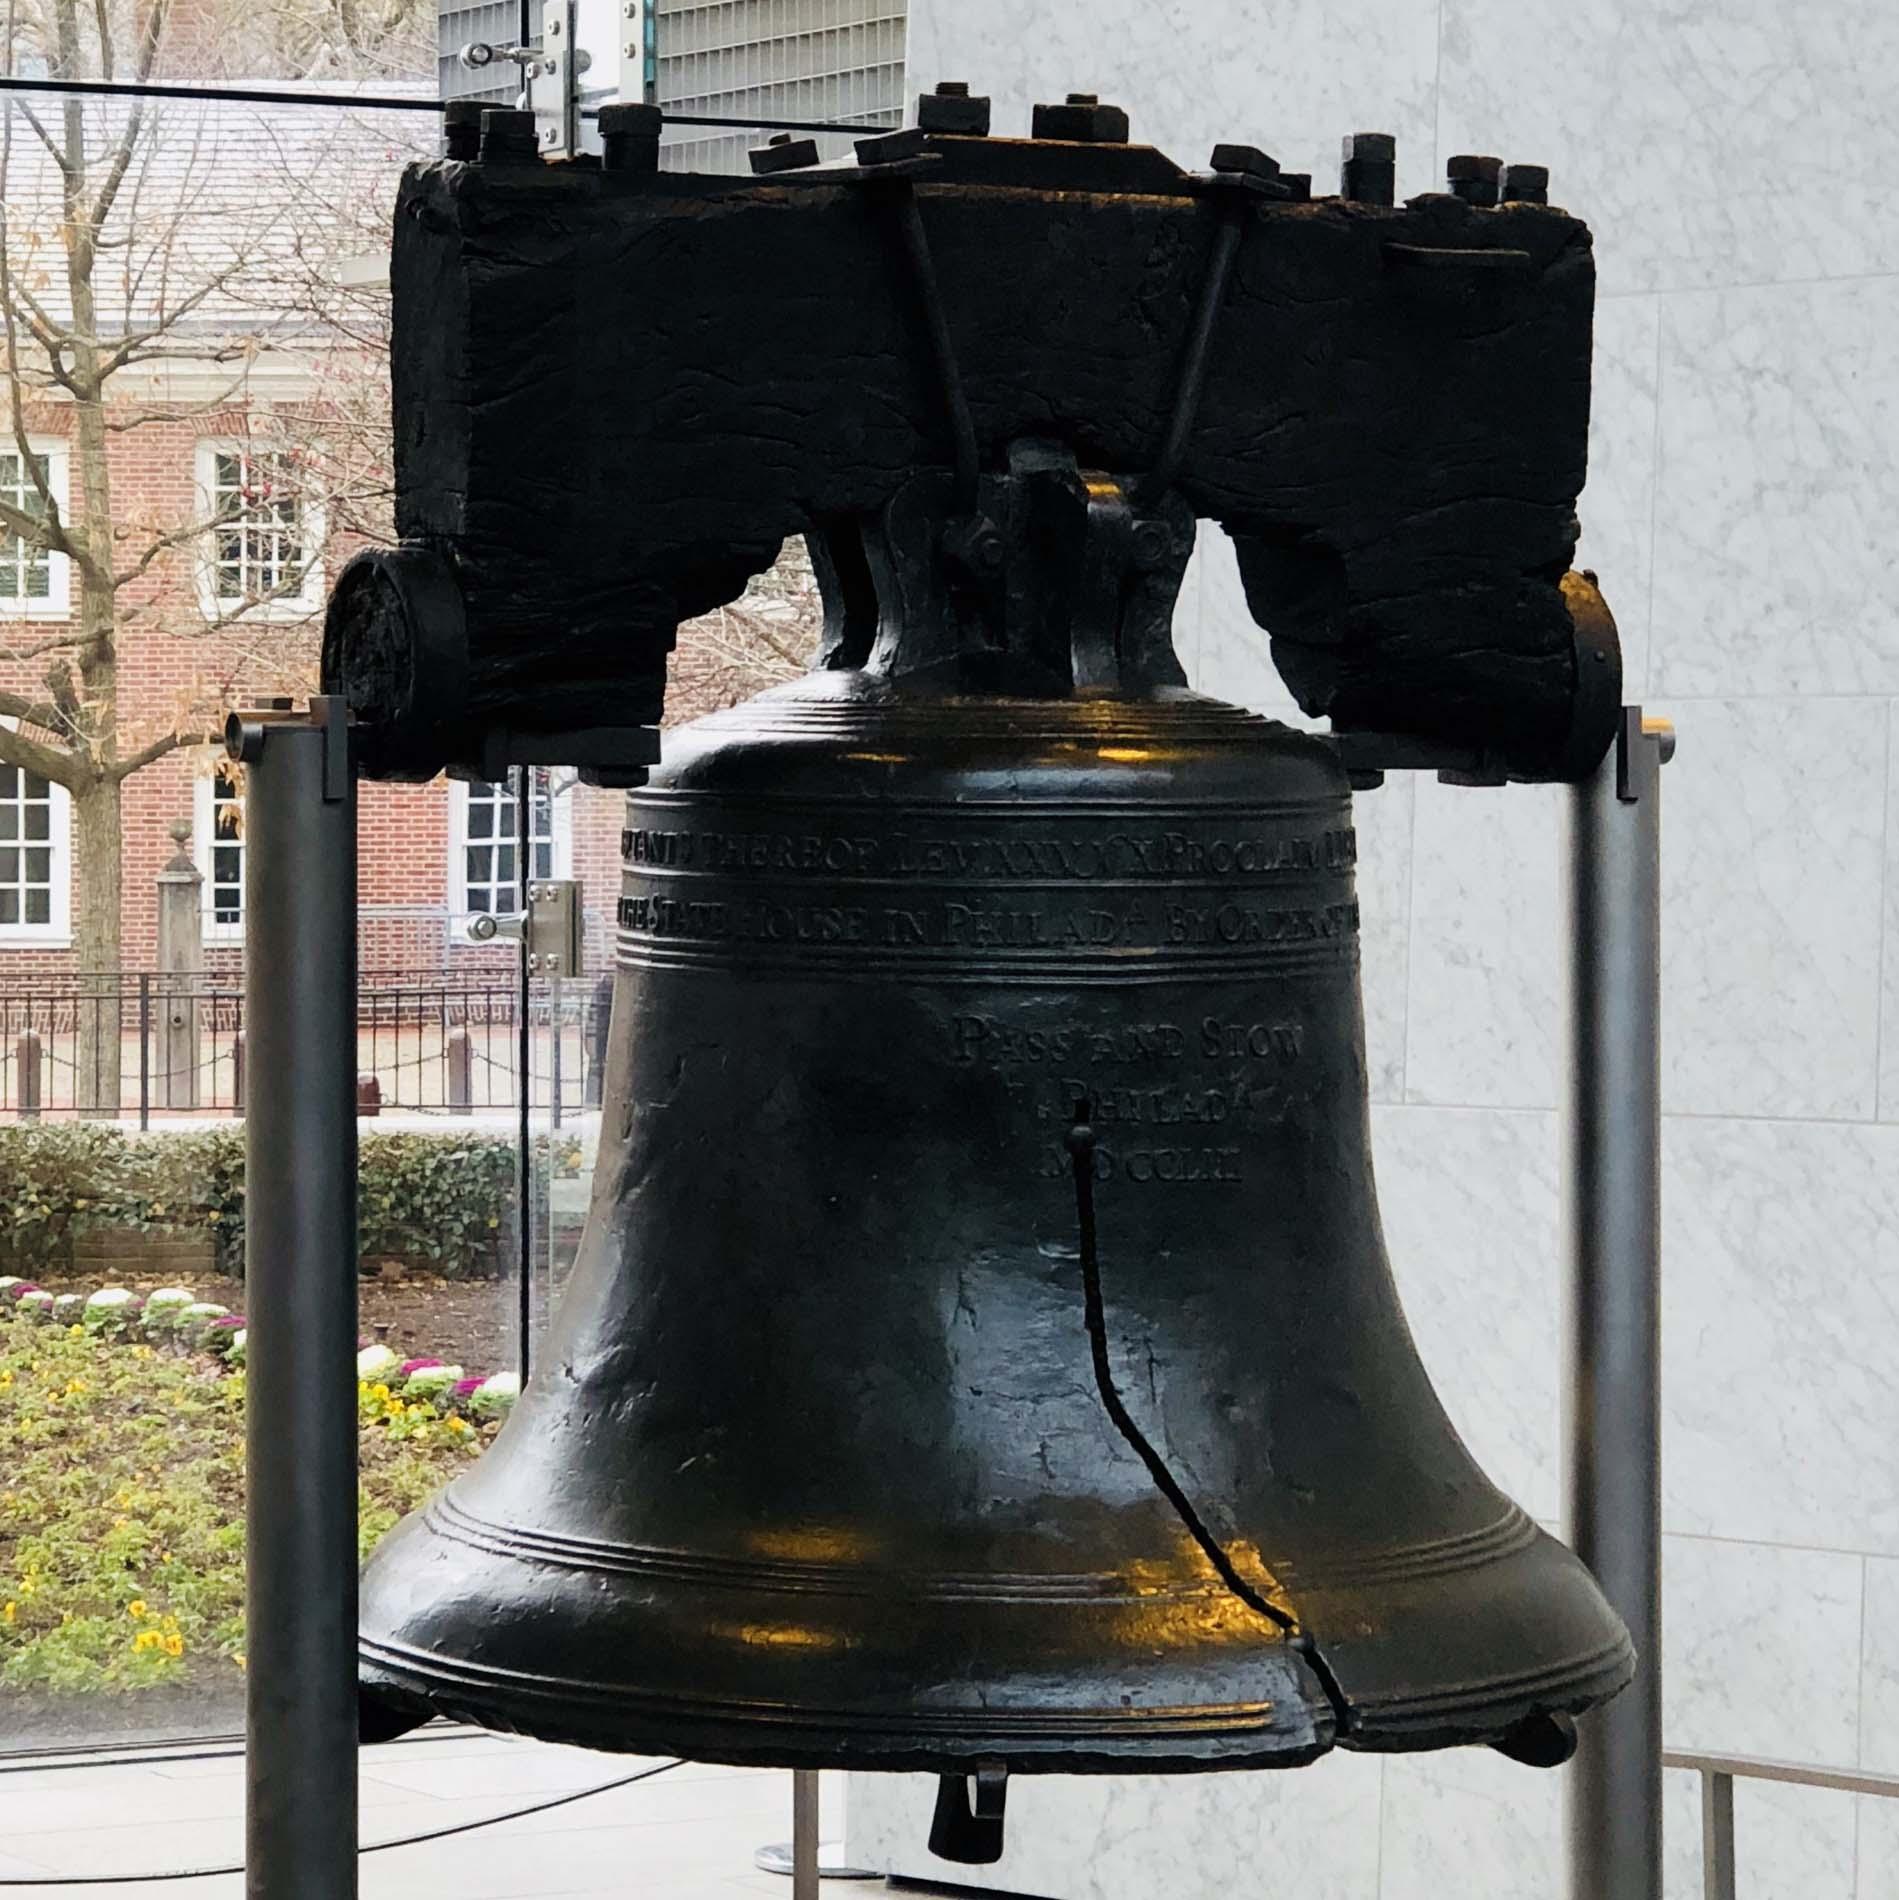 1.2-Liberty-Bell-etc.-PIXABAY-3-2.jpg